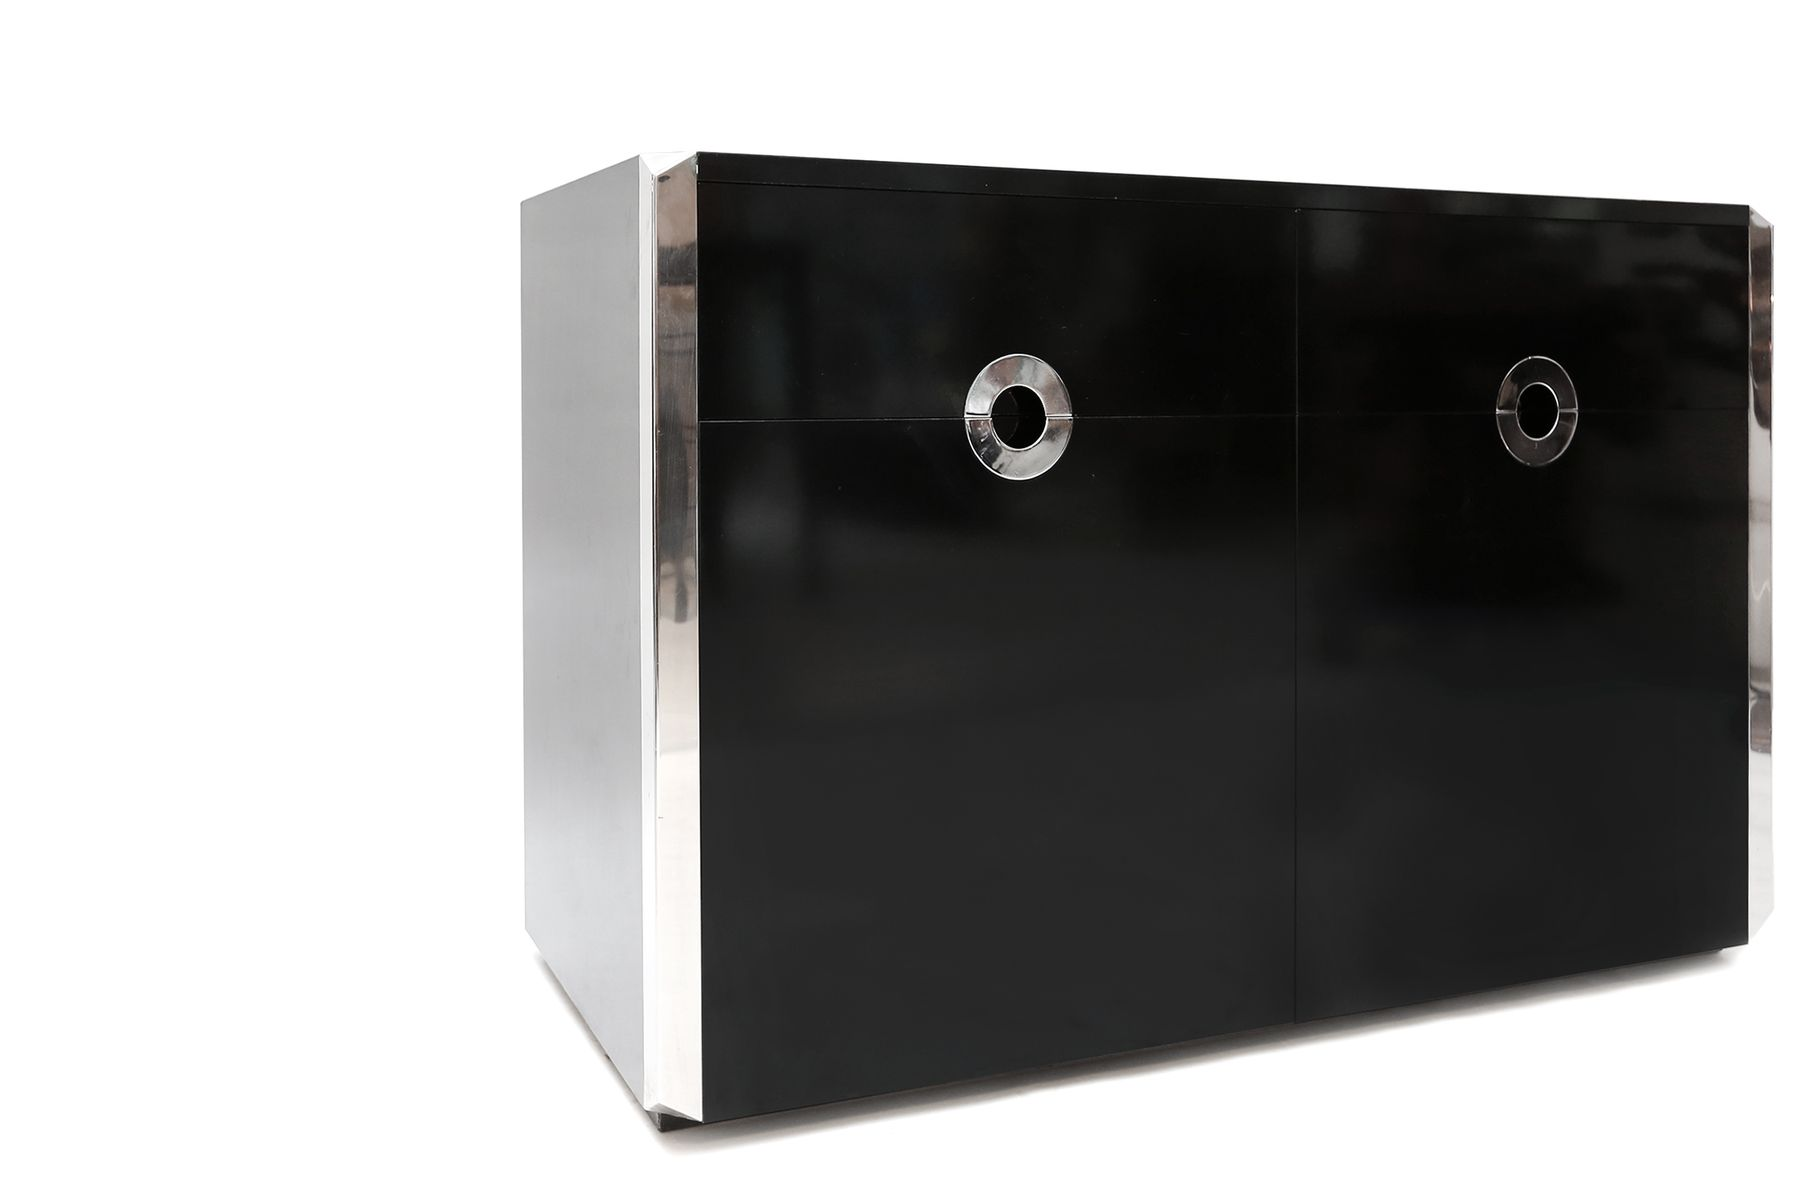 Grande armoire noire par willy rizzo pour mario sabot for Grande armoire noire